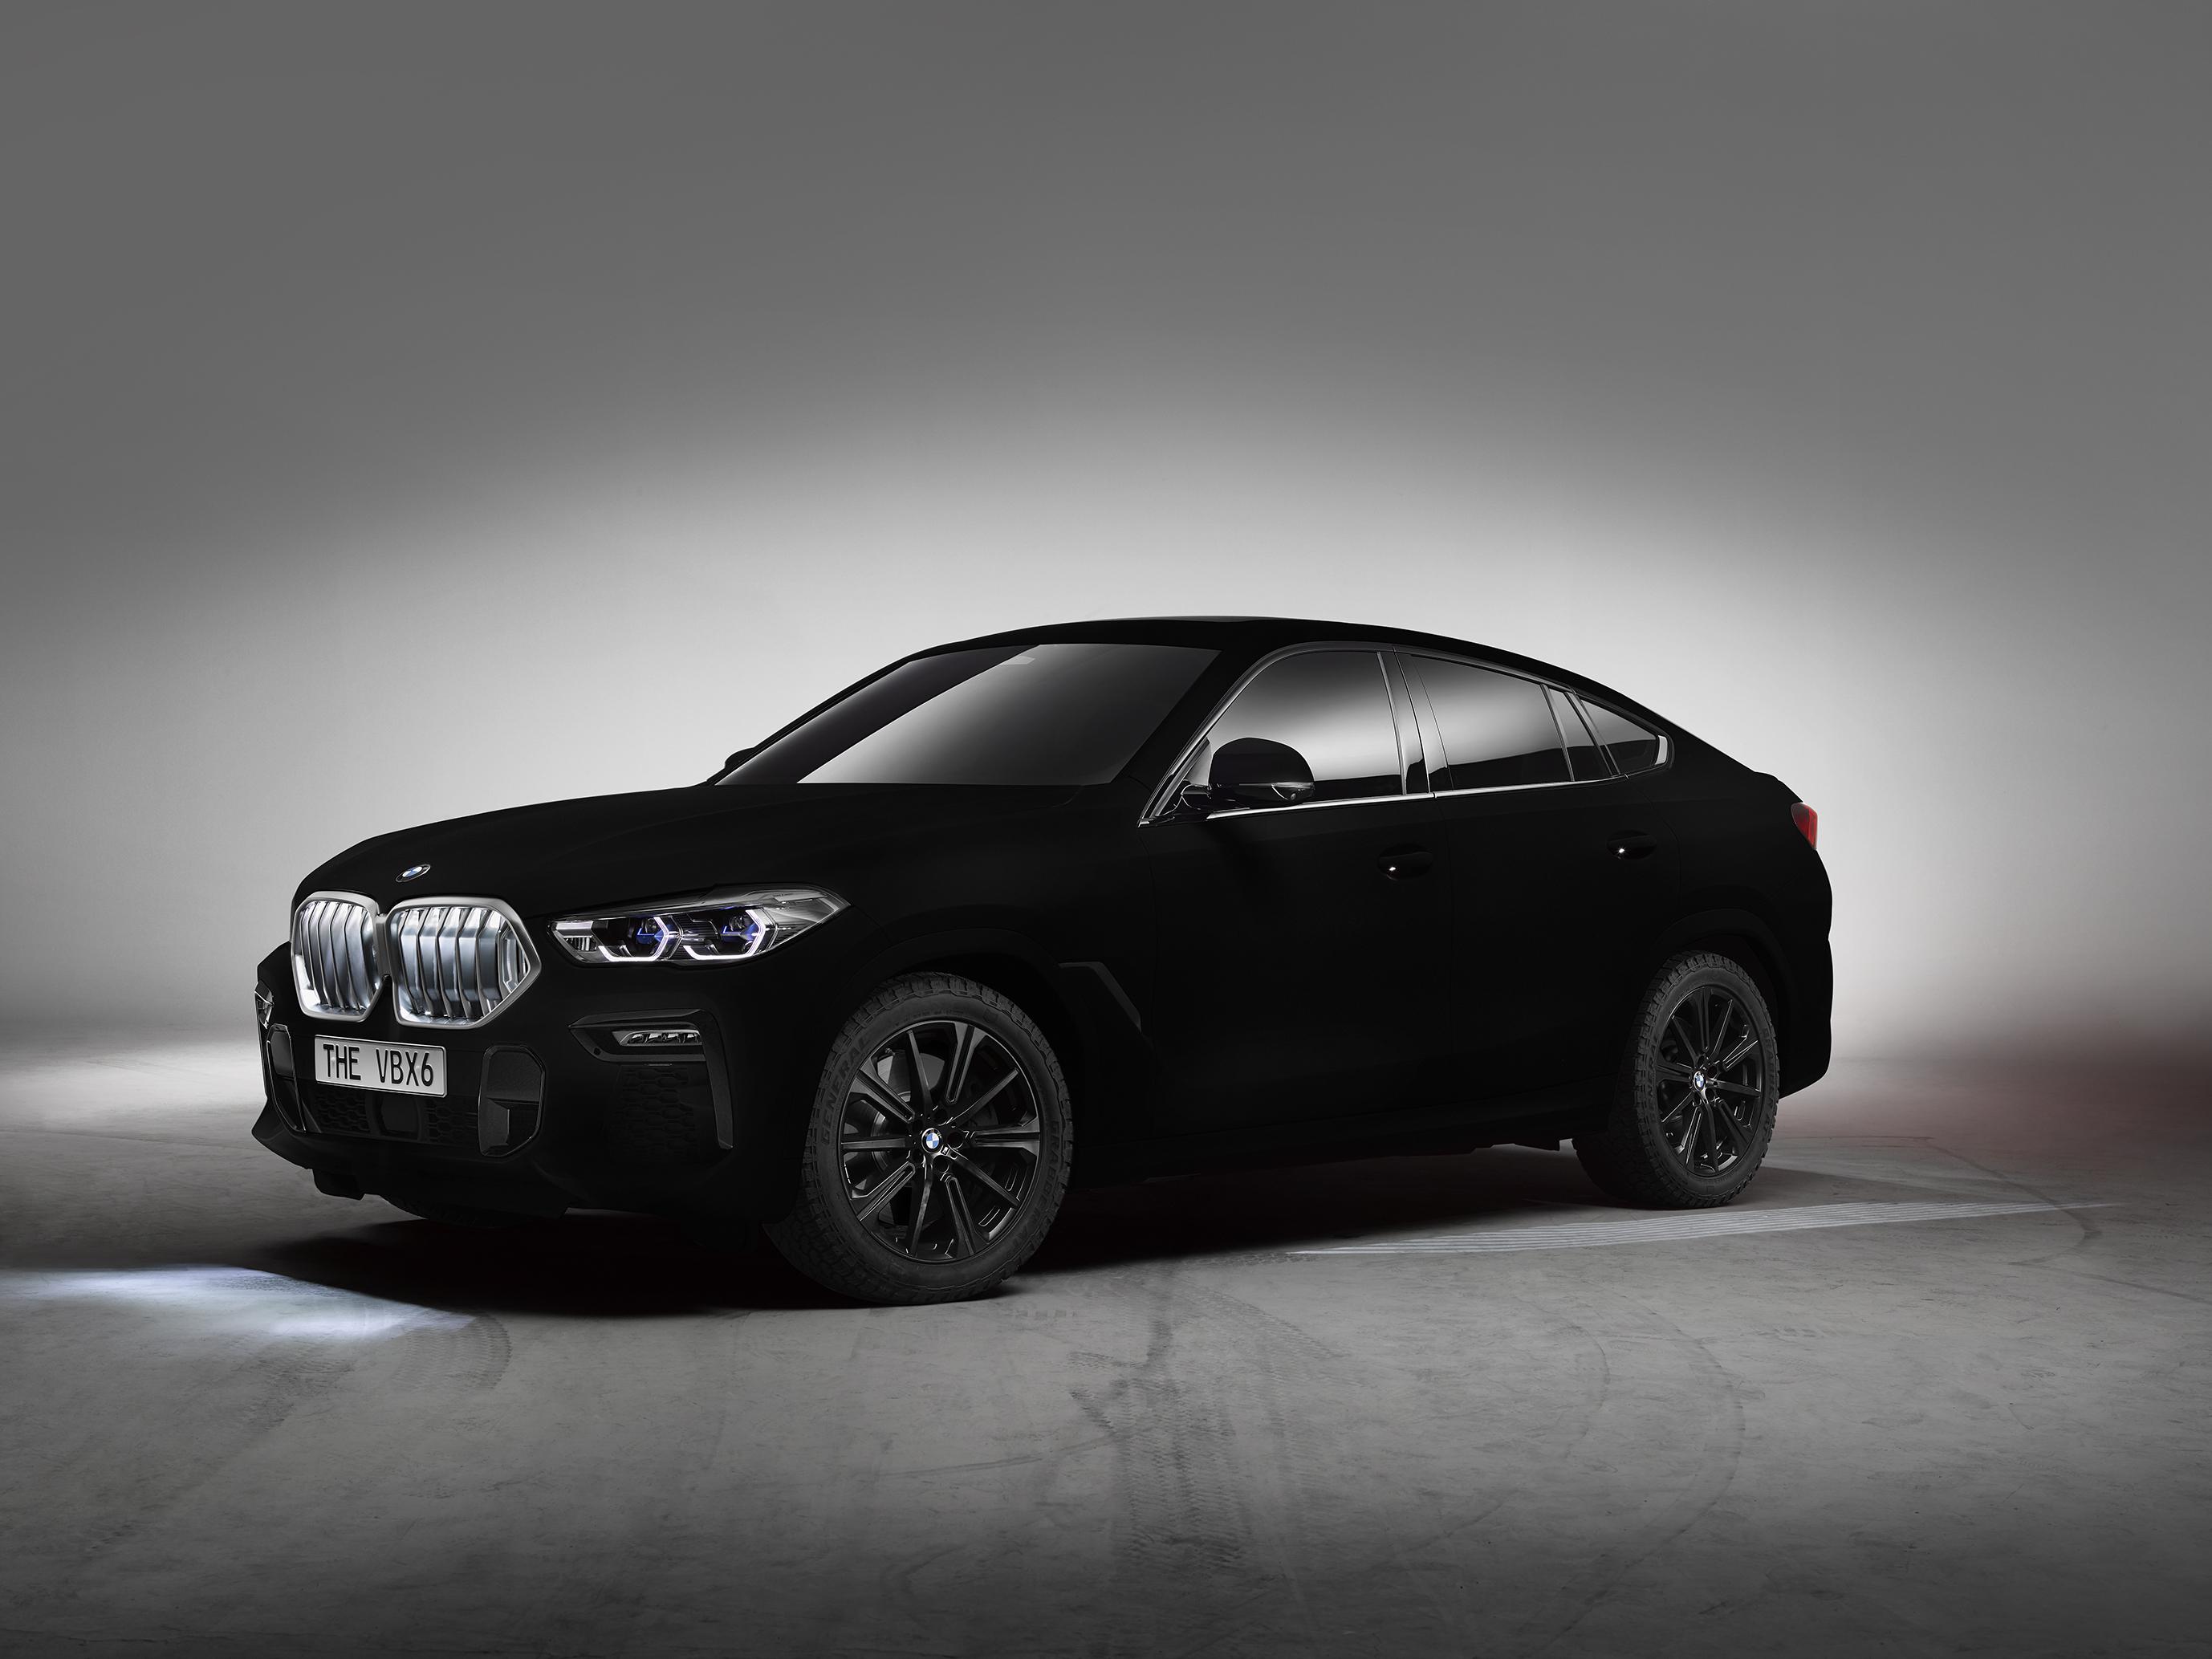 Noul BMW X6 in rol de show car spectaculos: primul automobil in Vantablack din lume